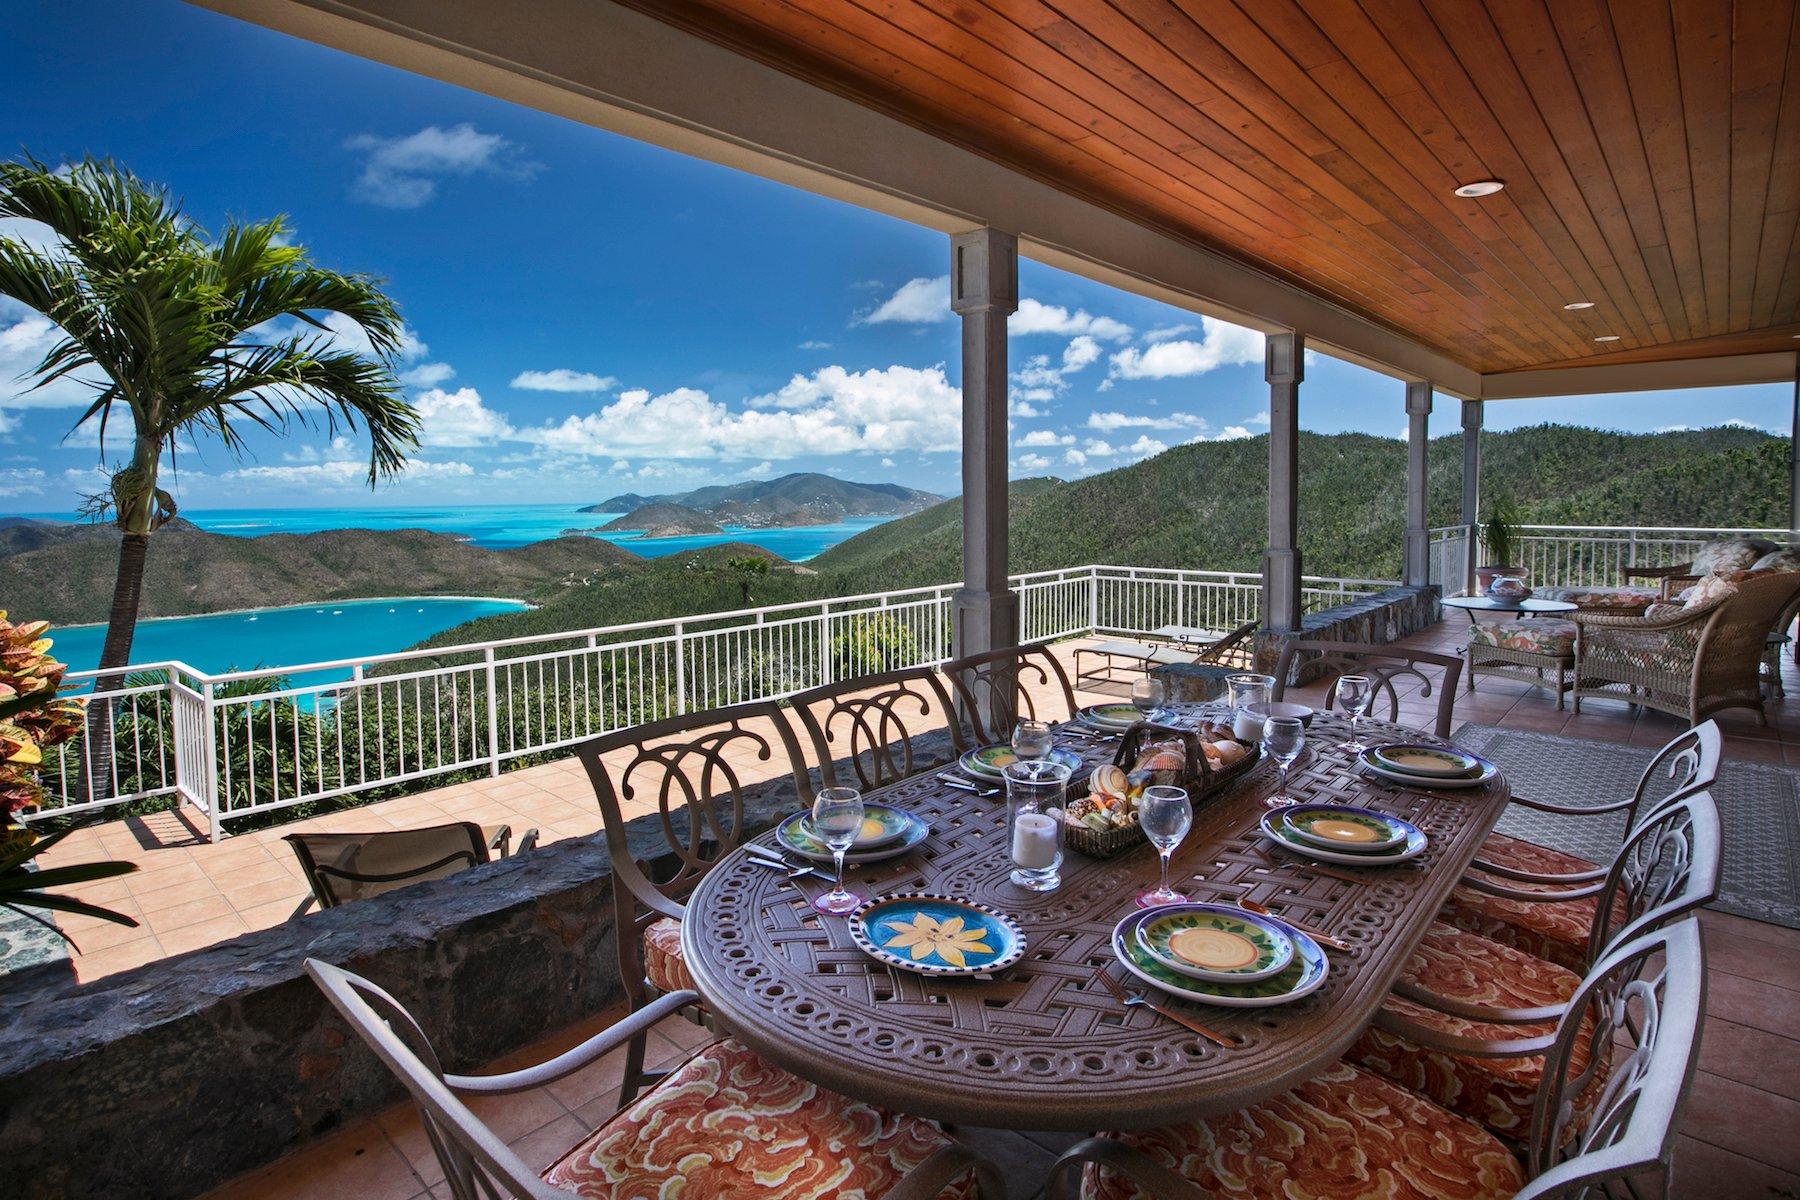 House in Cruz Bay, St. John, U.S. Virgin Islands 1